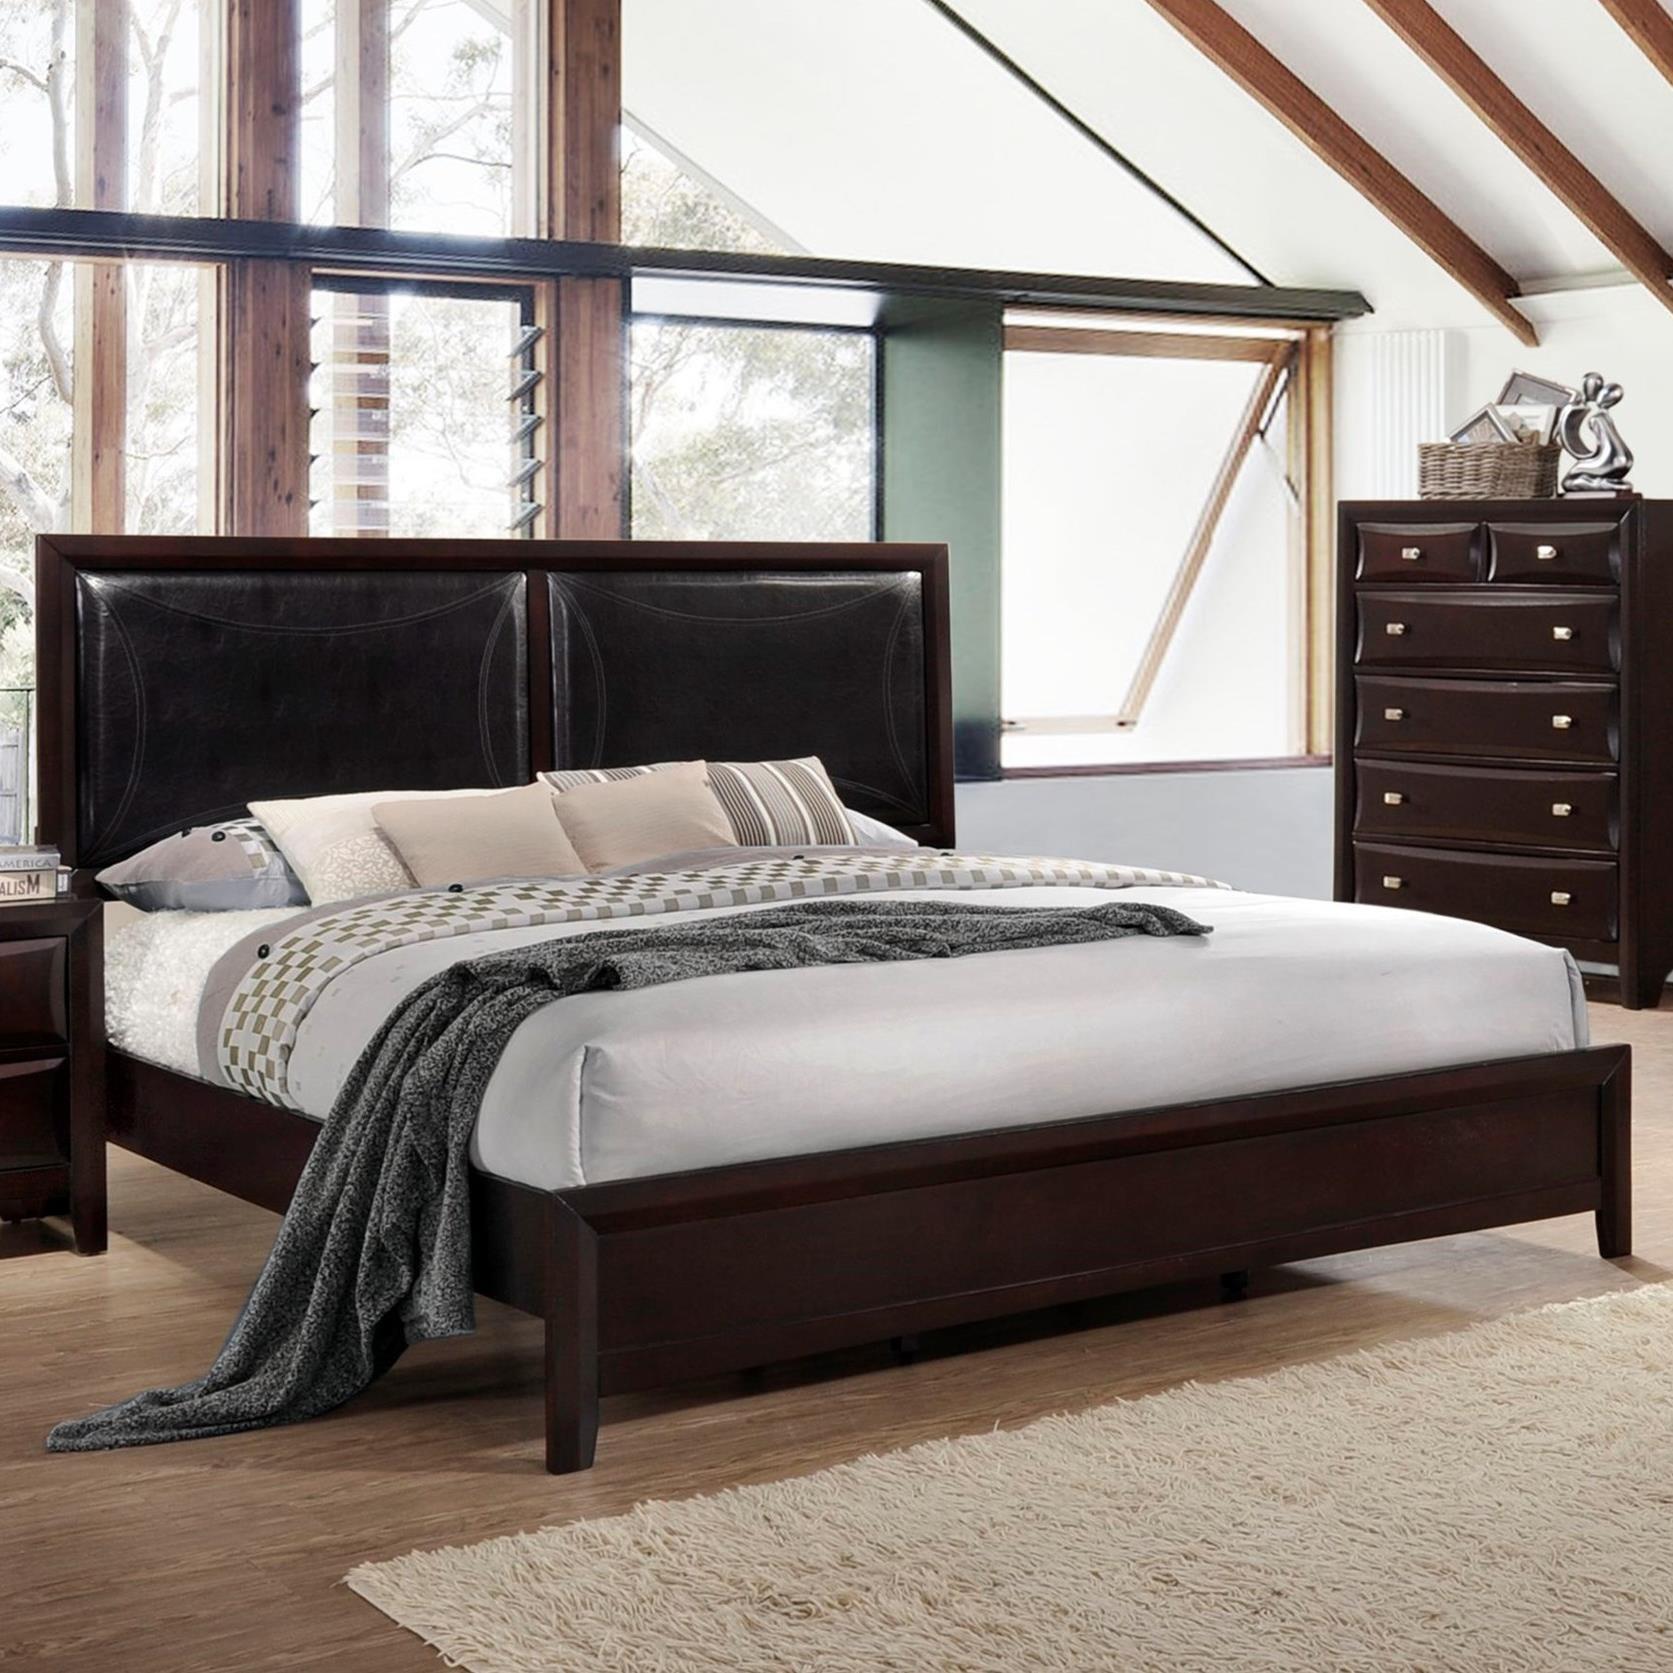 Picture of: Lifestyle Jessgal King Platform Bed With Upholstered Headboard Royal Furniture Platform Beds Low Profile Beds